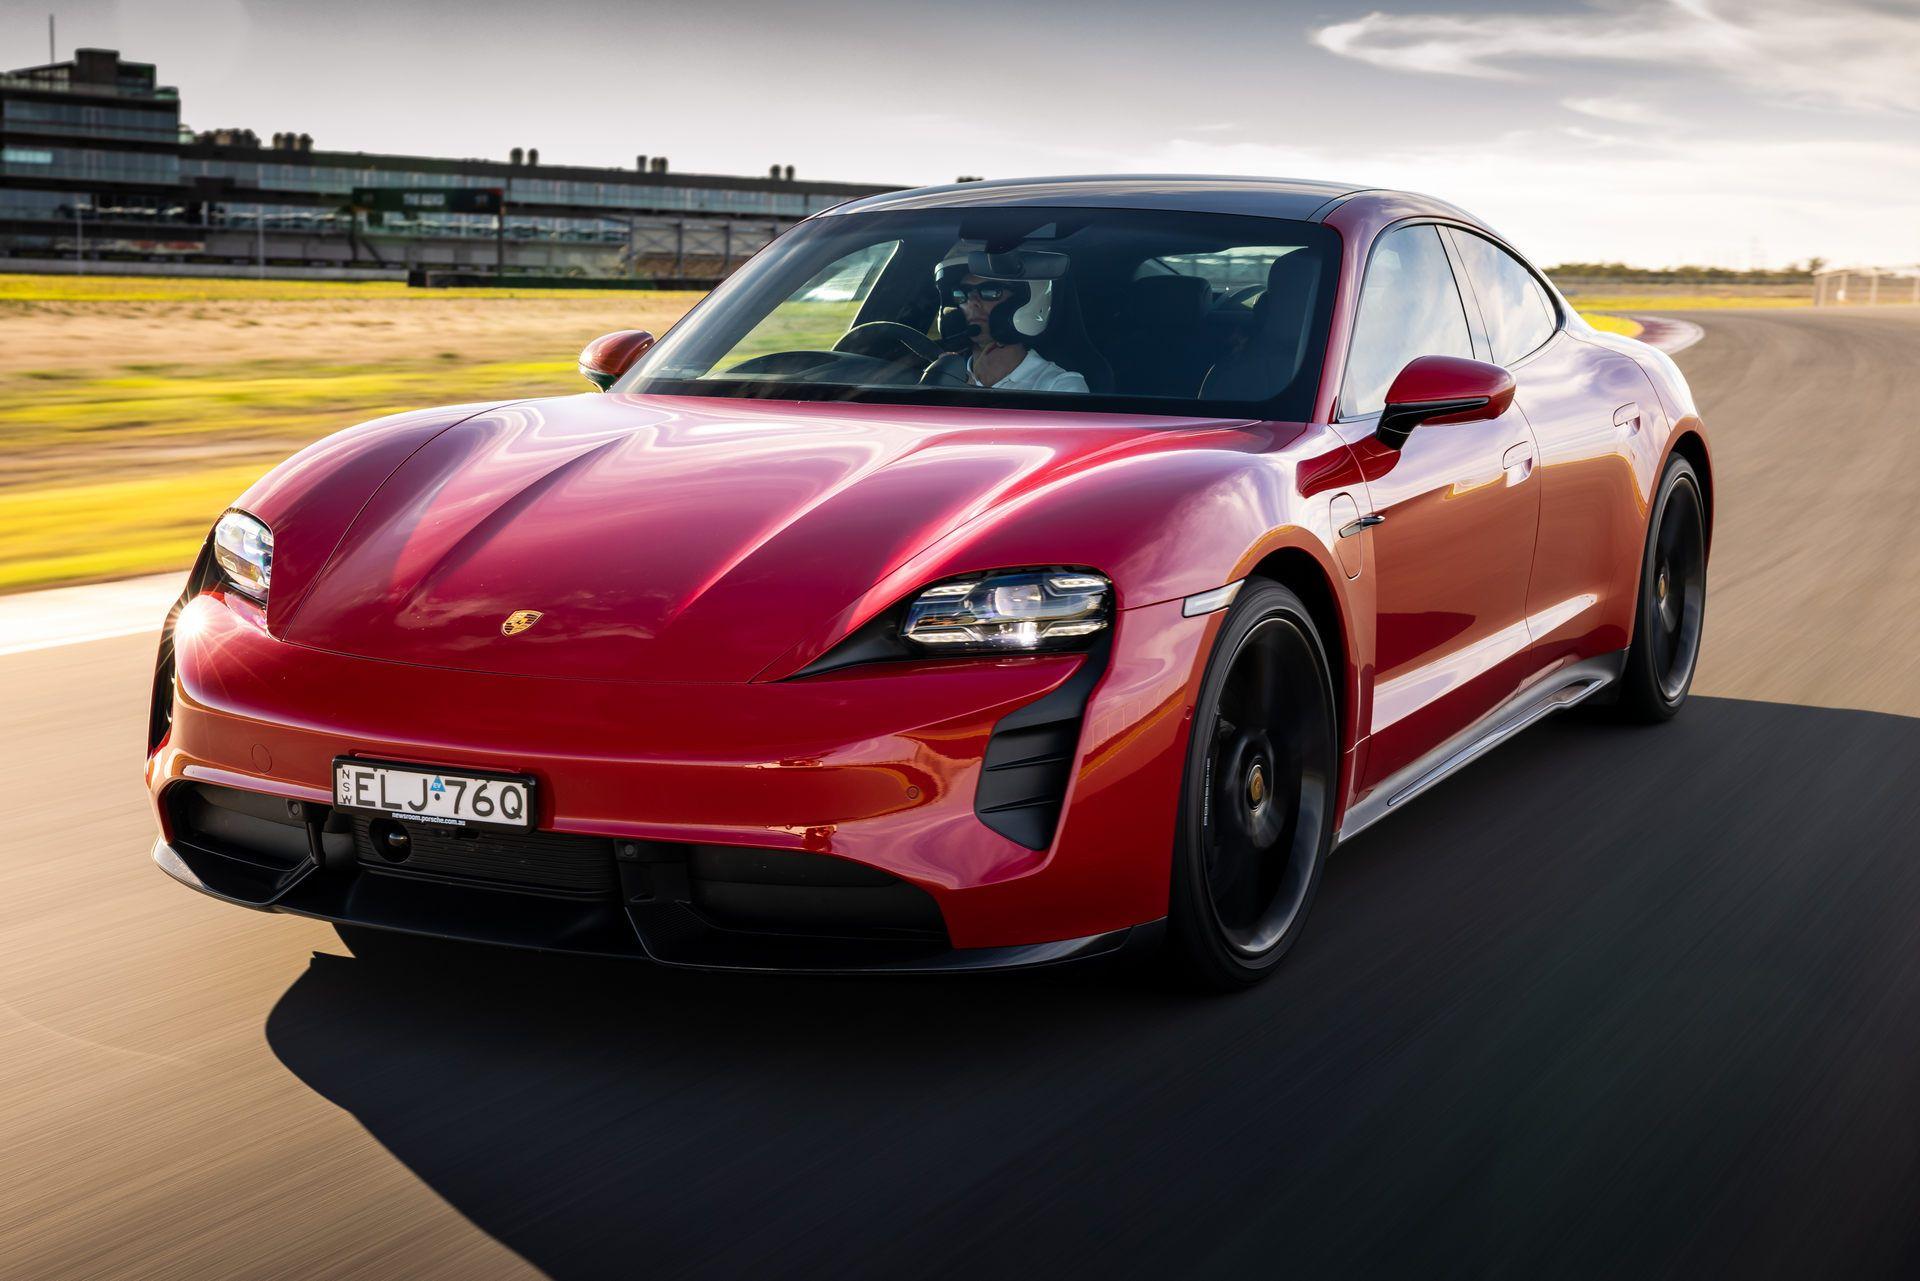 Porsche-Taycan-Turbo-S-The-Bend-Motorsport-Park-23